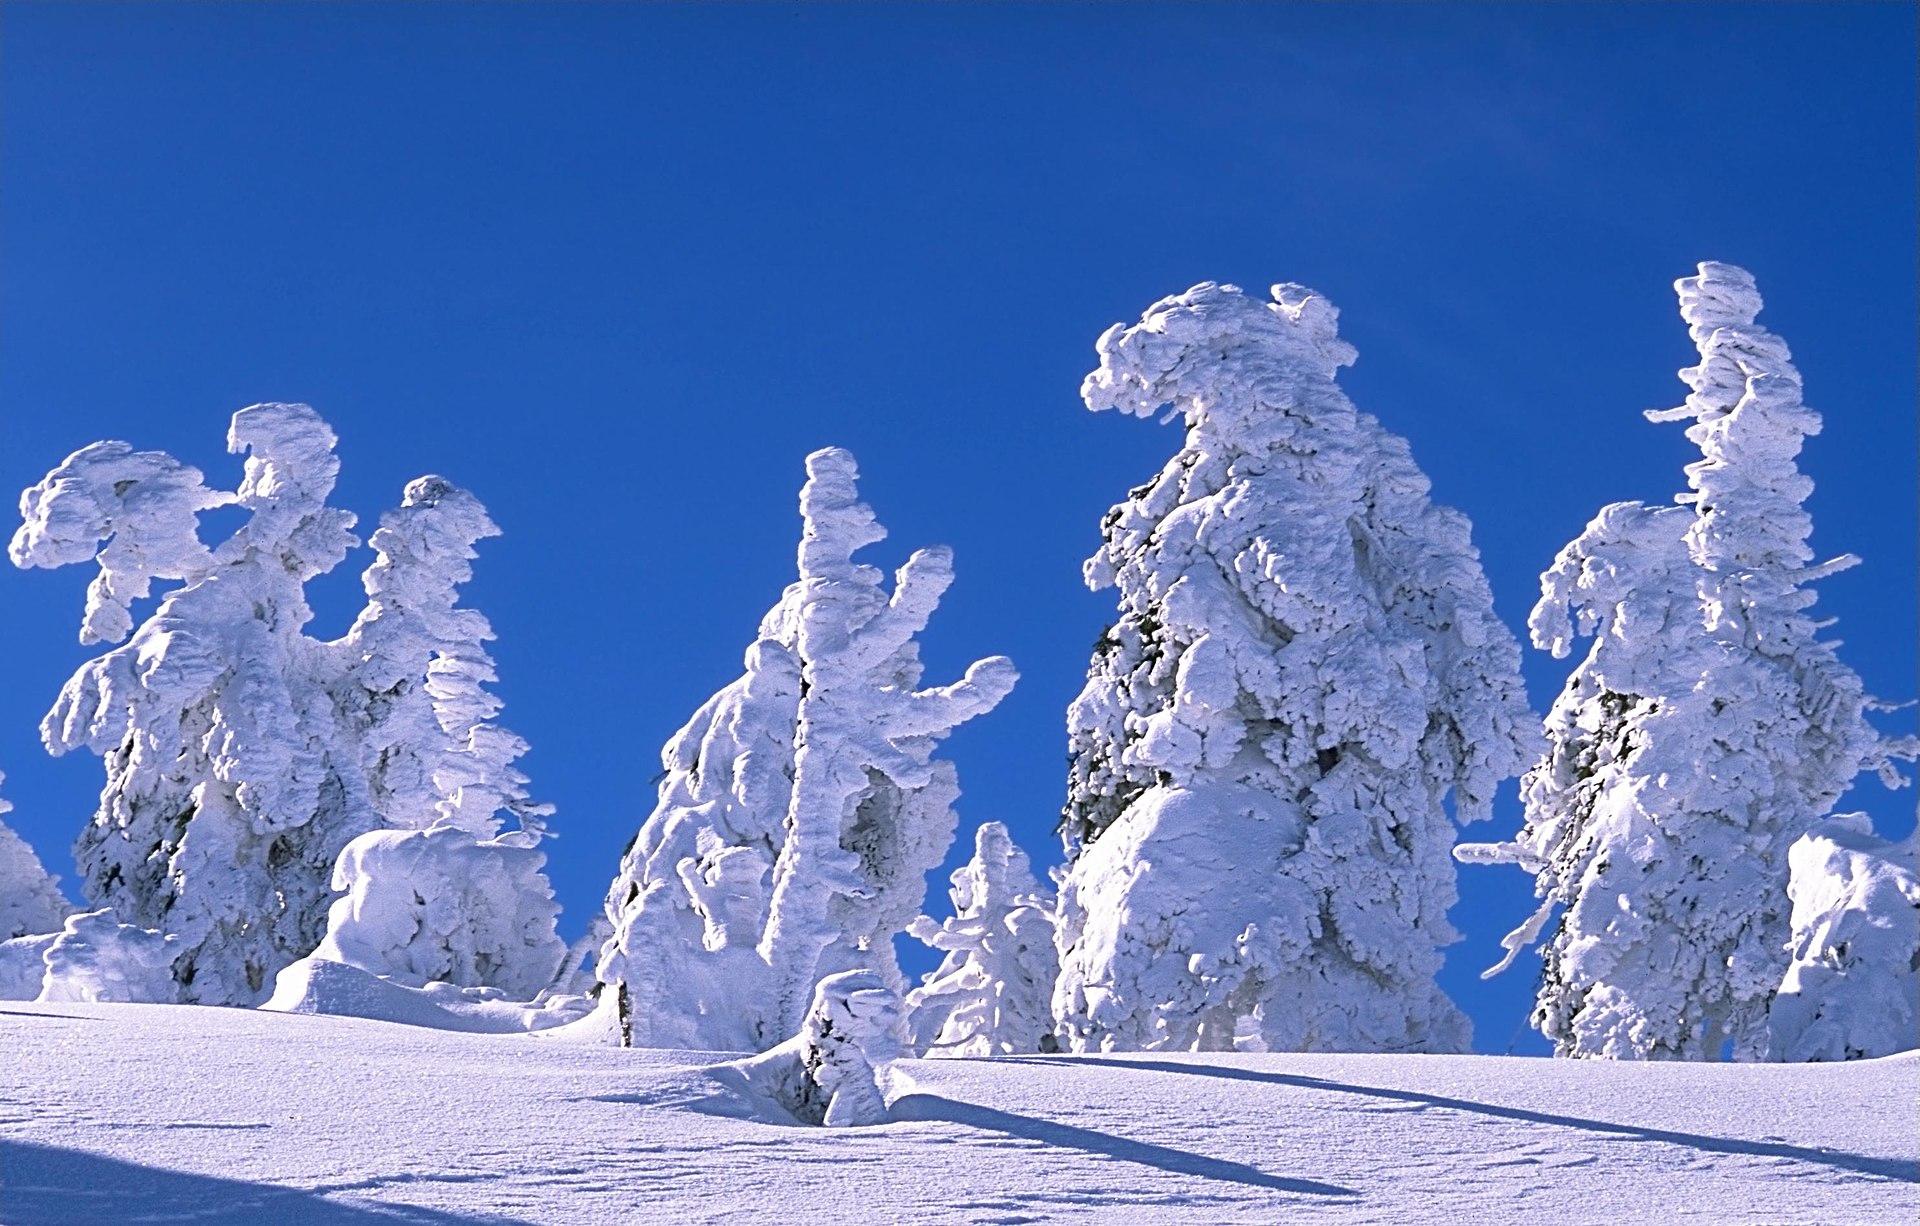 Lumen Sulaminen